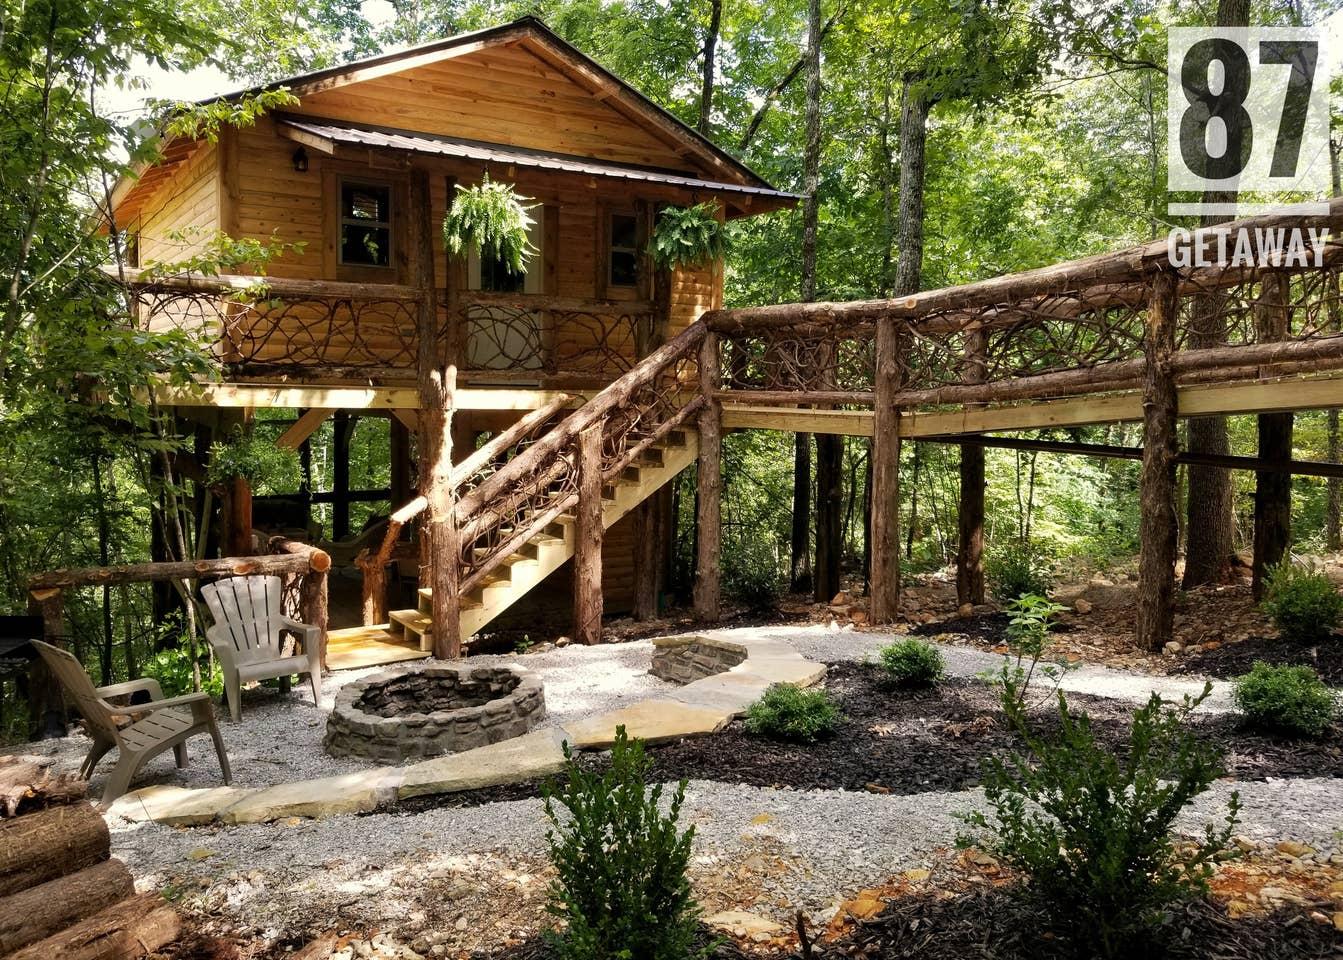 87Getaway Treehouse Escape